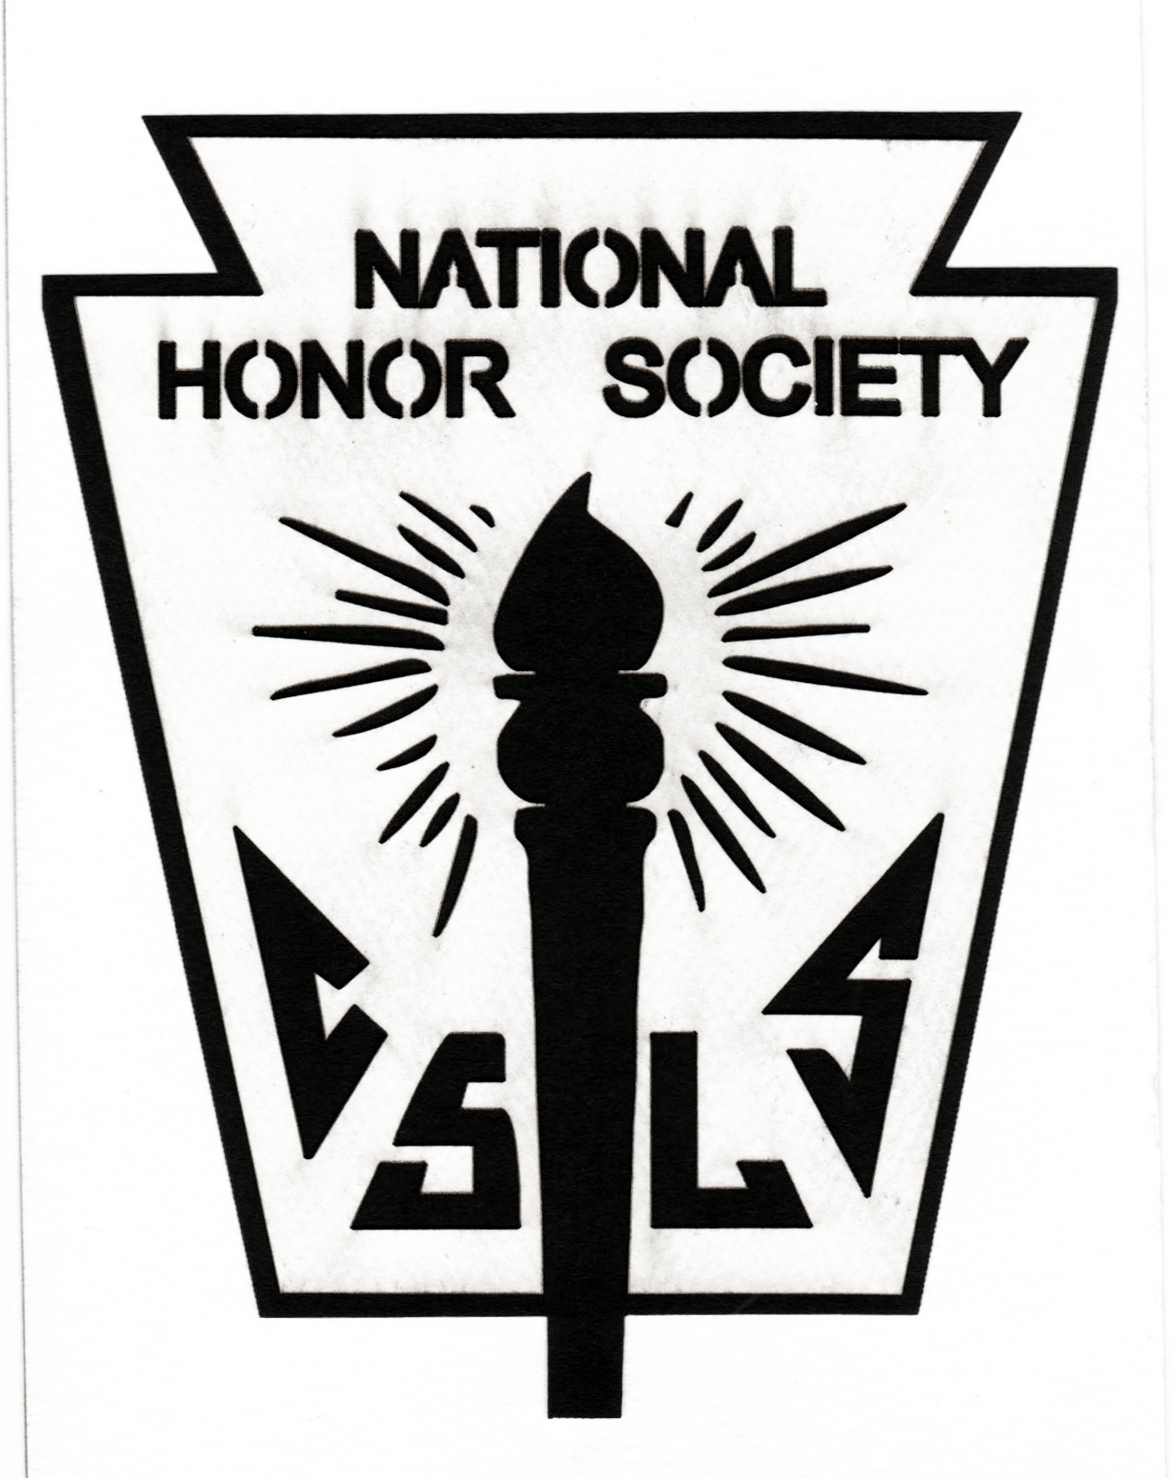 nhshonorsociety – Newport High School National Honor Society image royalty free library